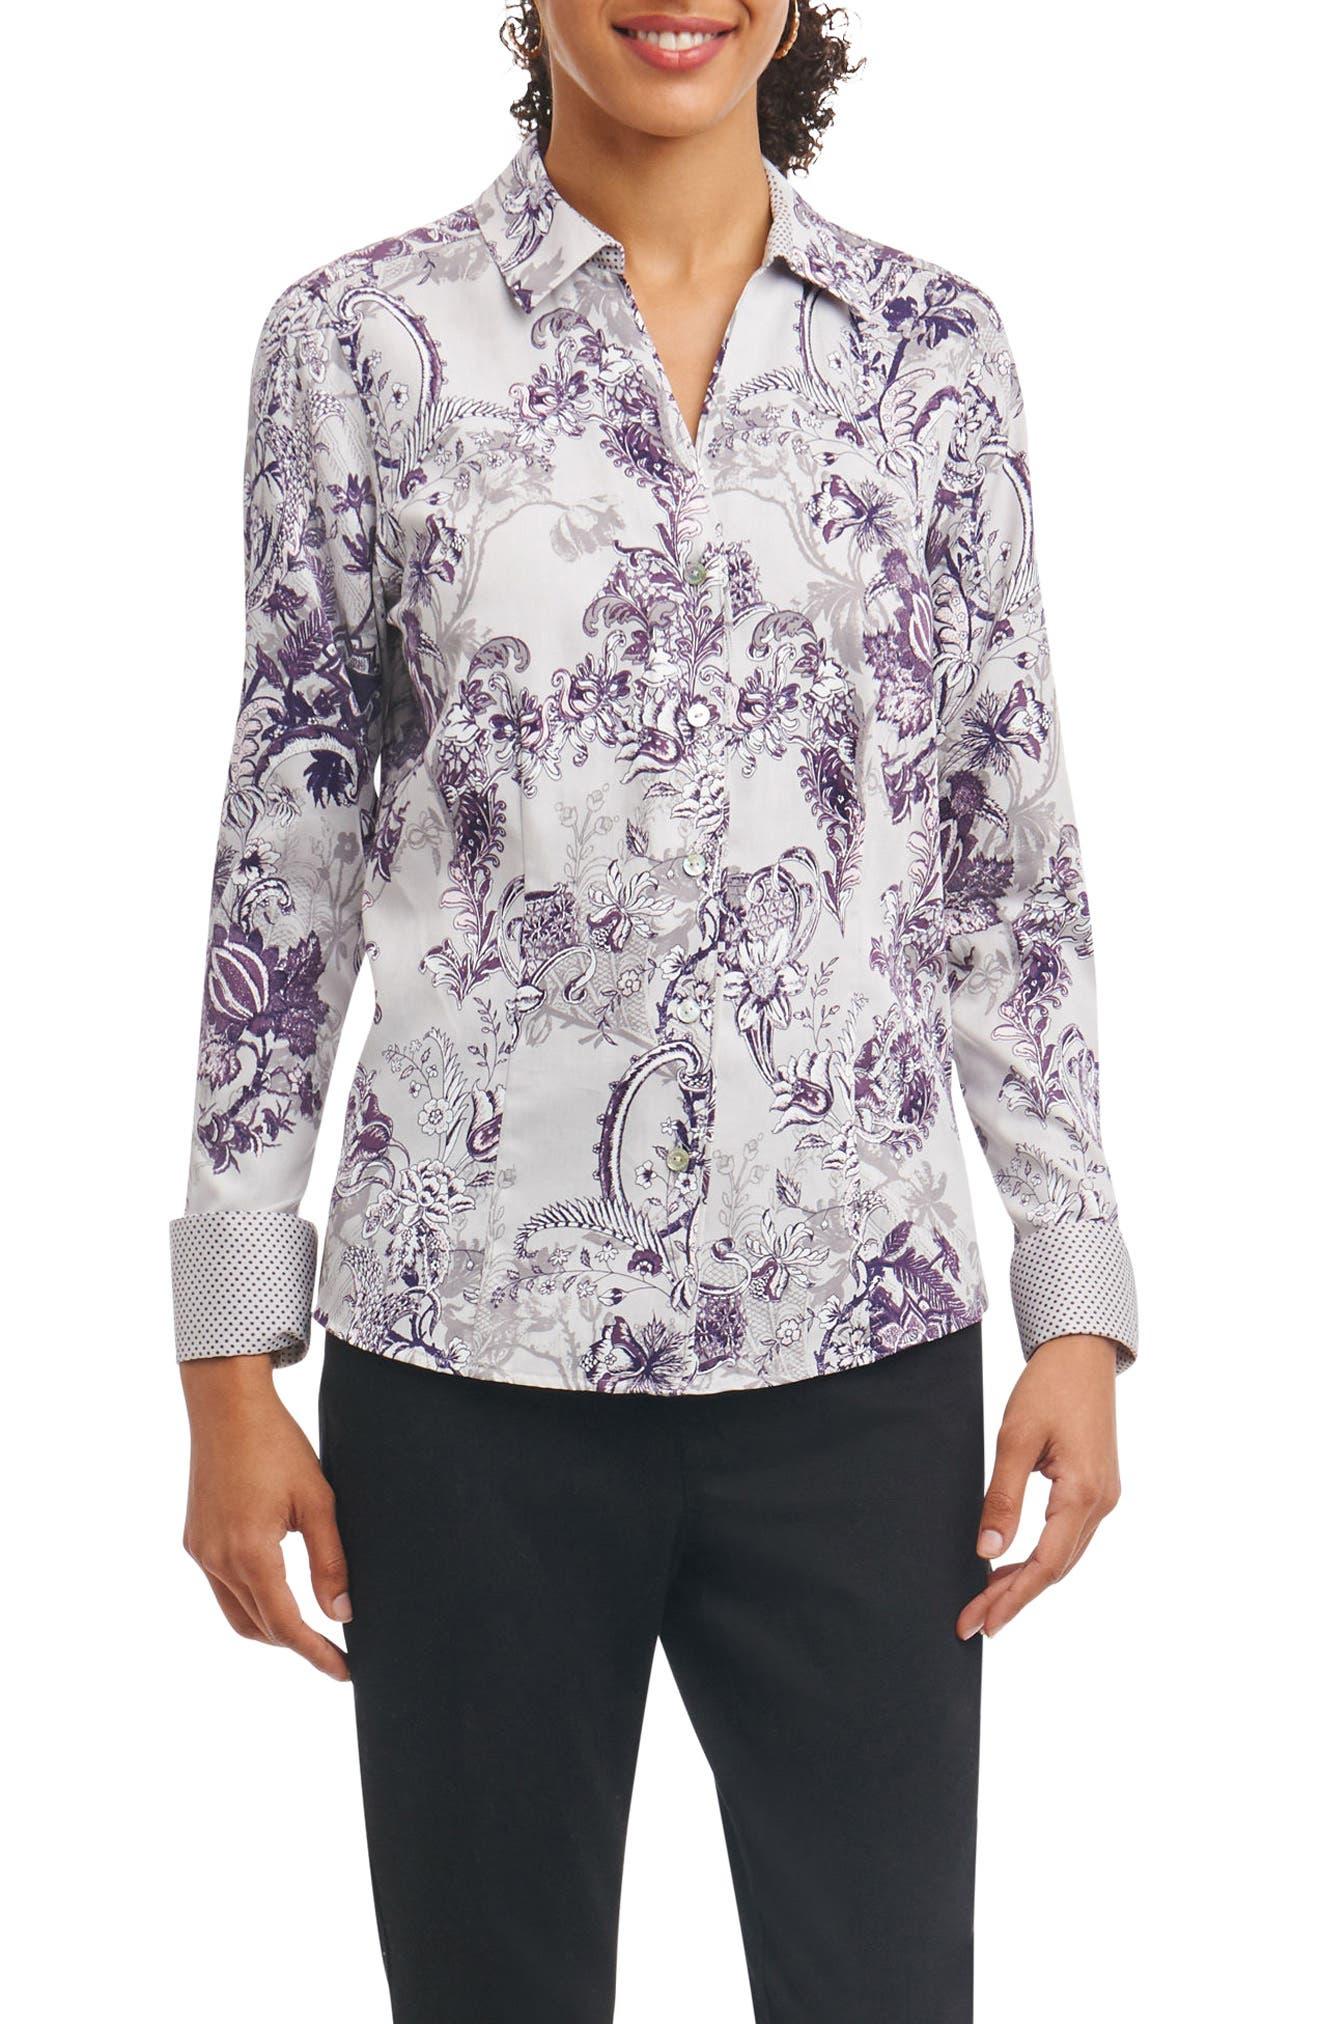 Alternate Image 1 Selected - Foxcroft Lauren Floral Tapestry Wrinkle Free Shirt (Regular & Petite)